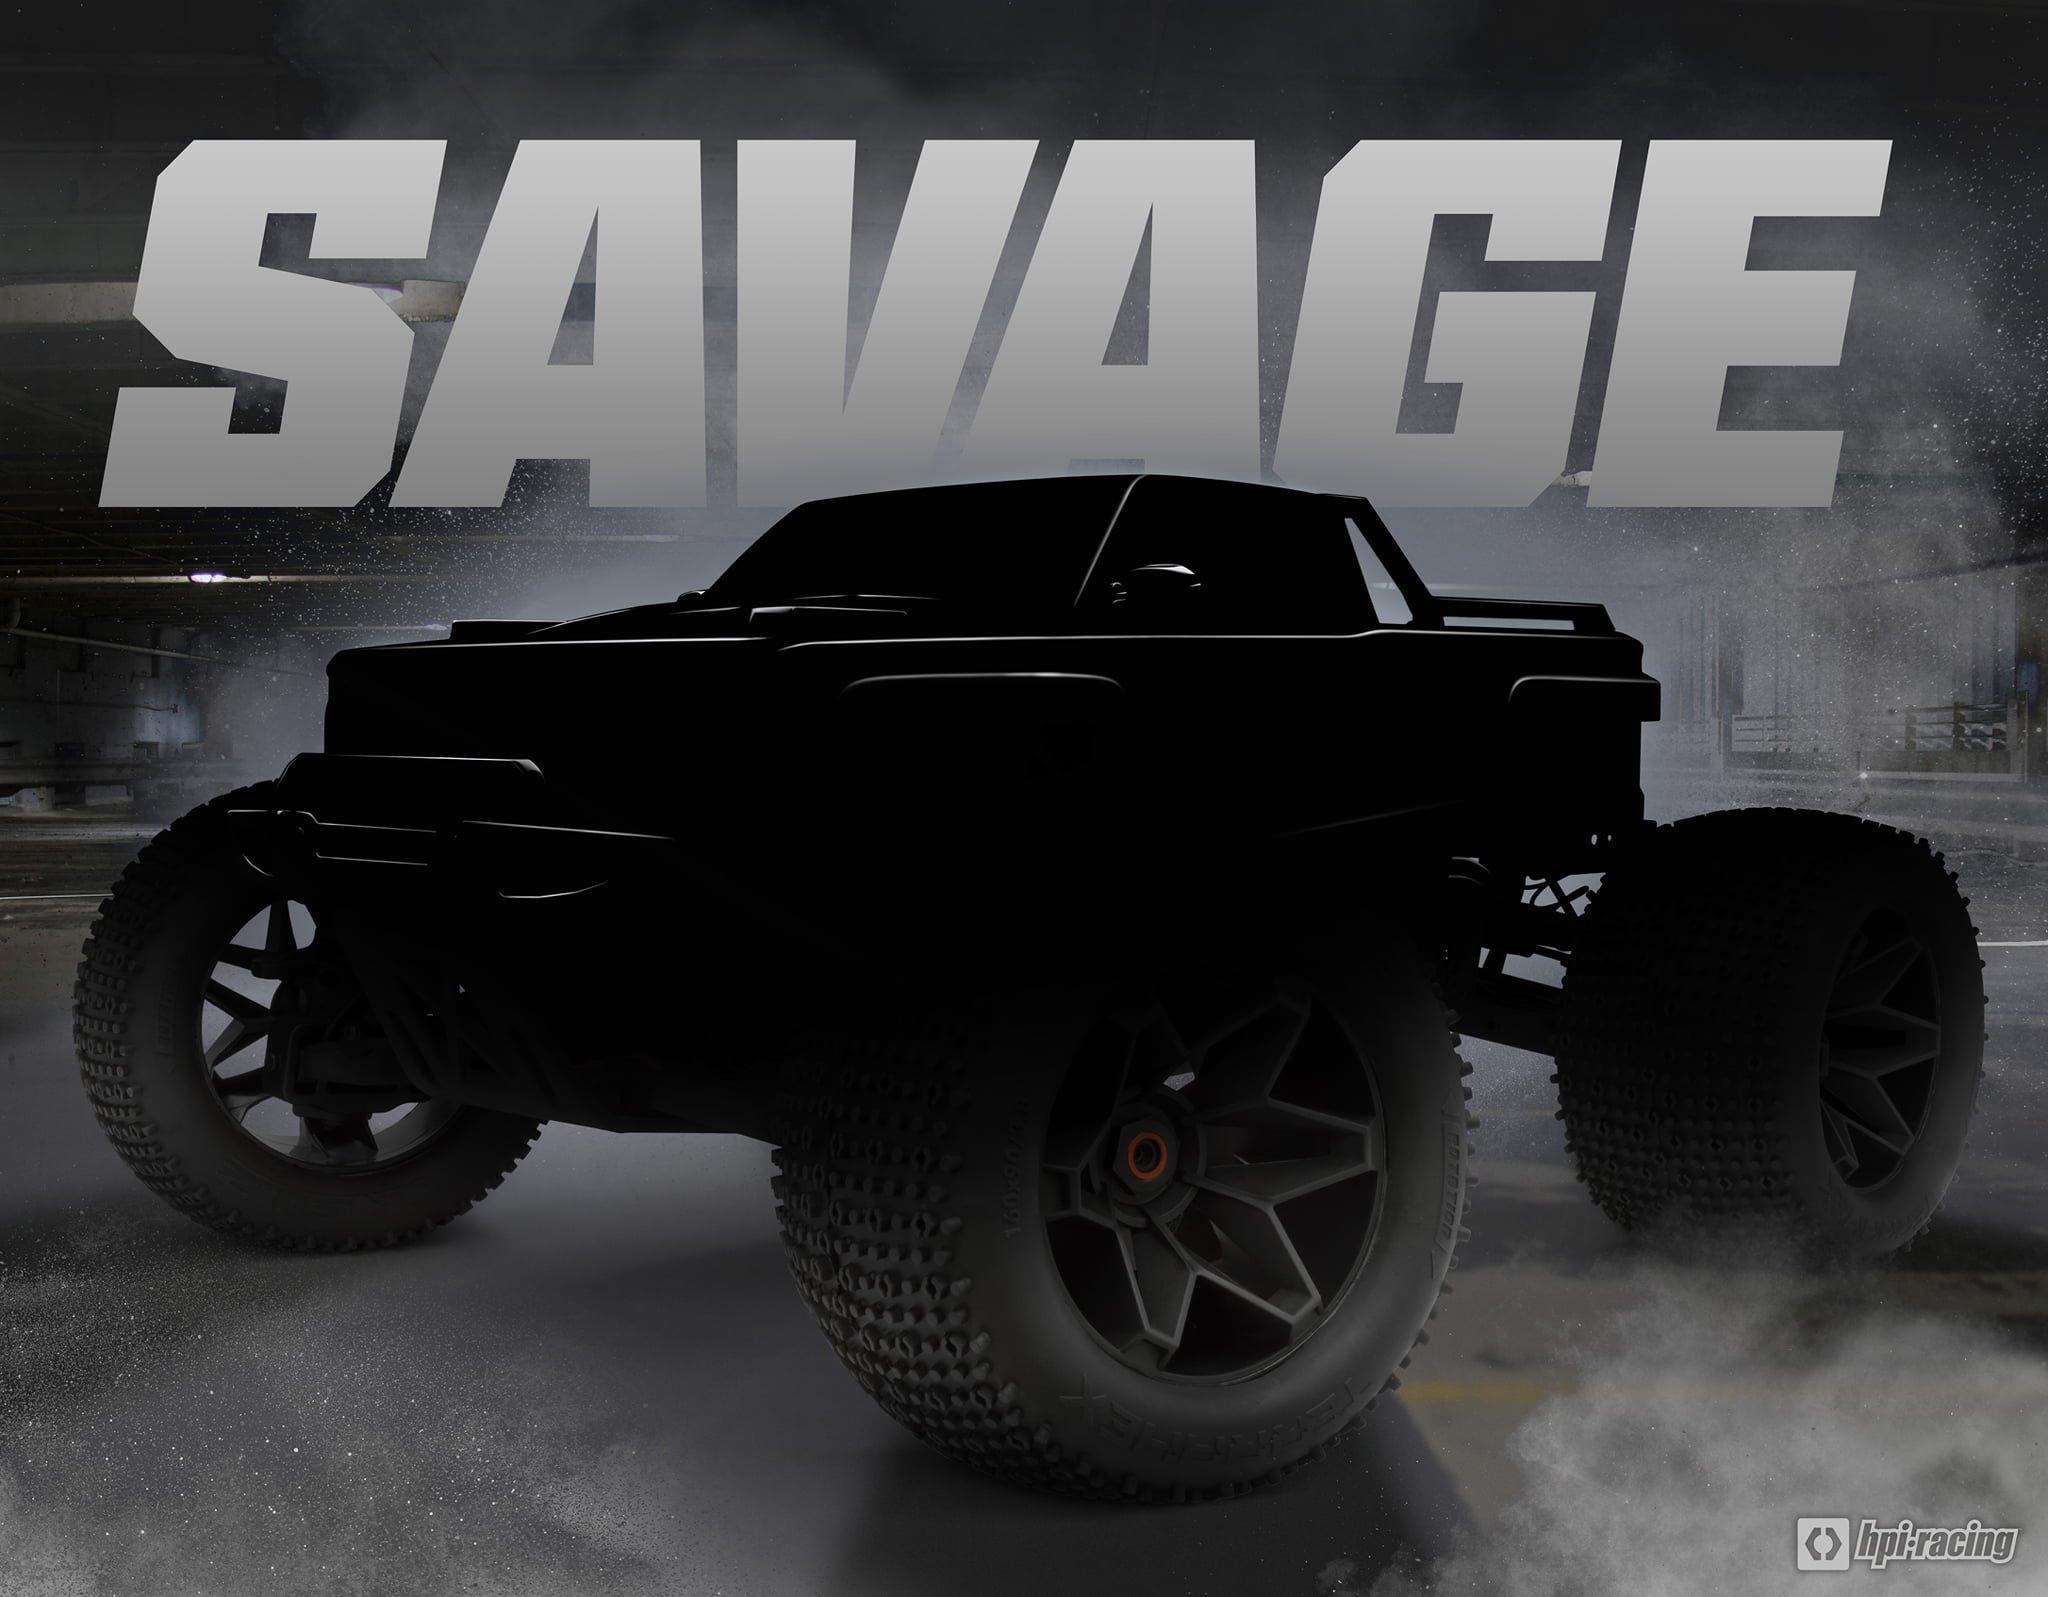 The HPI Savage is back, again... again?